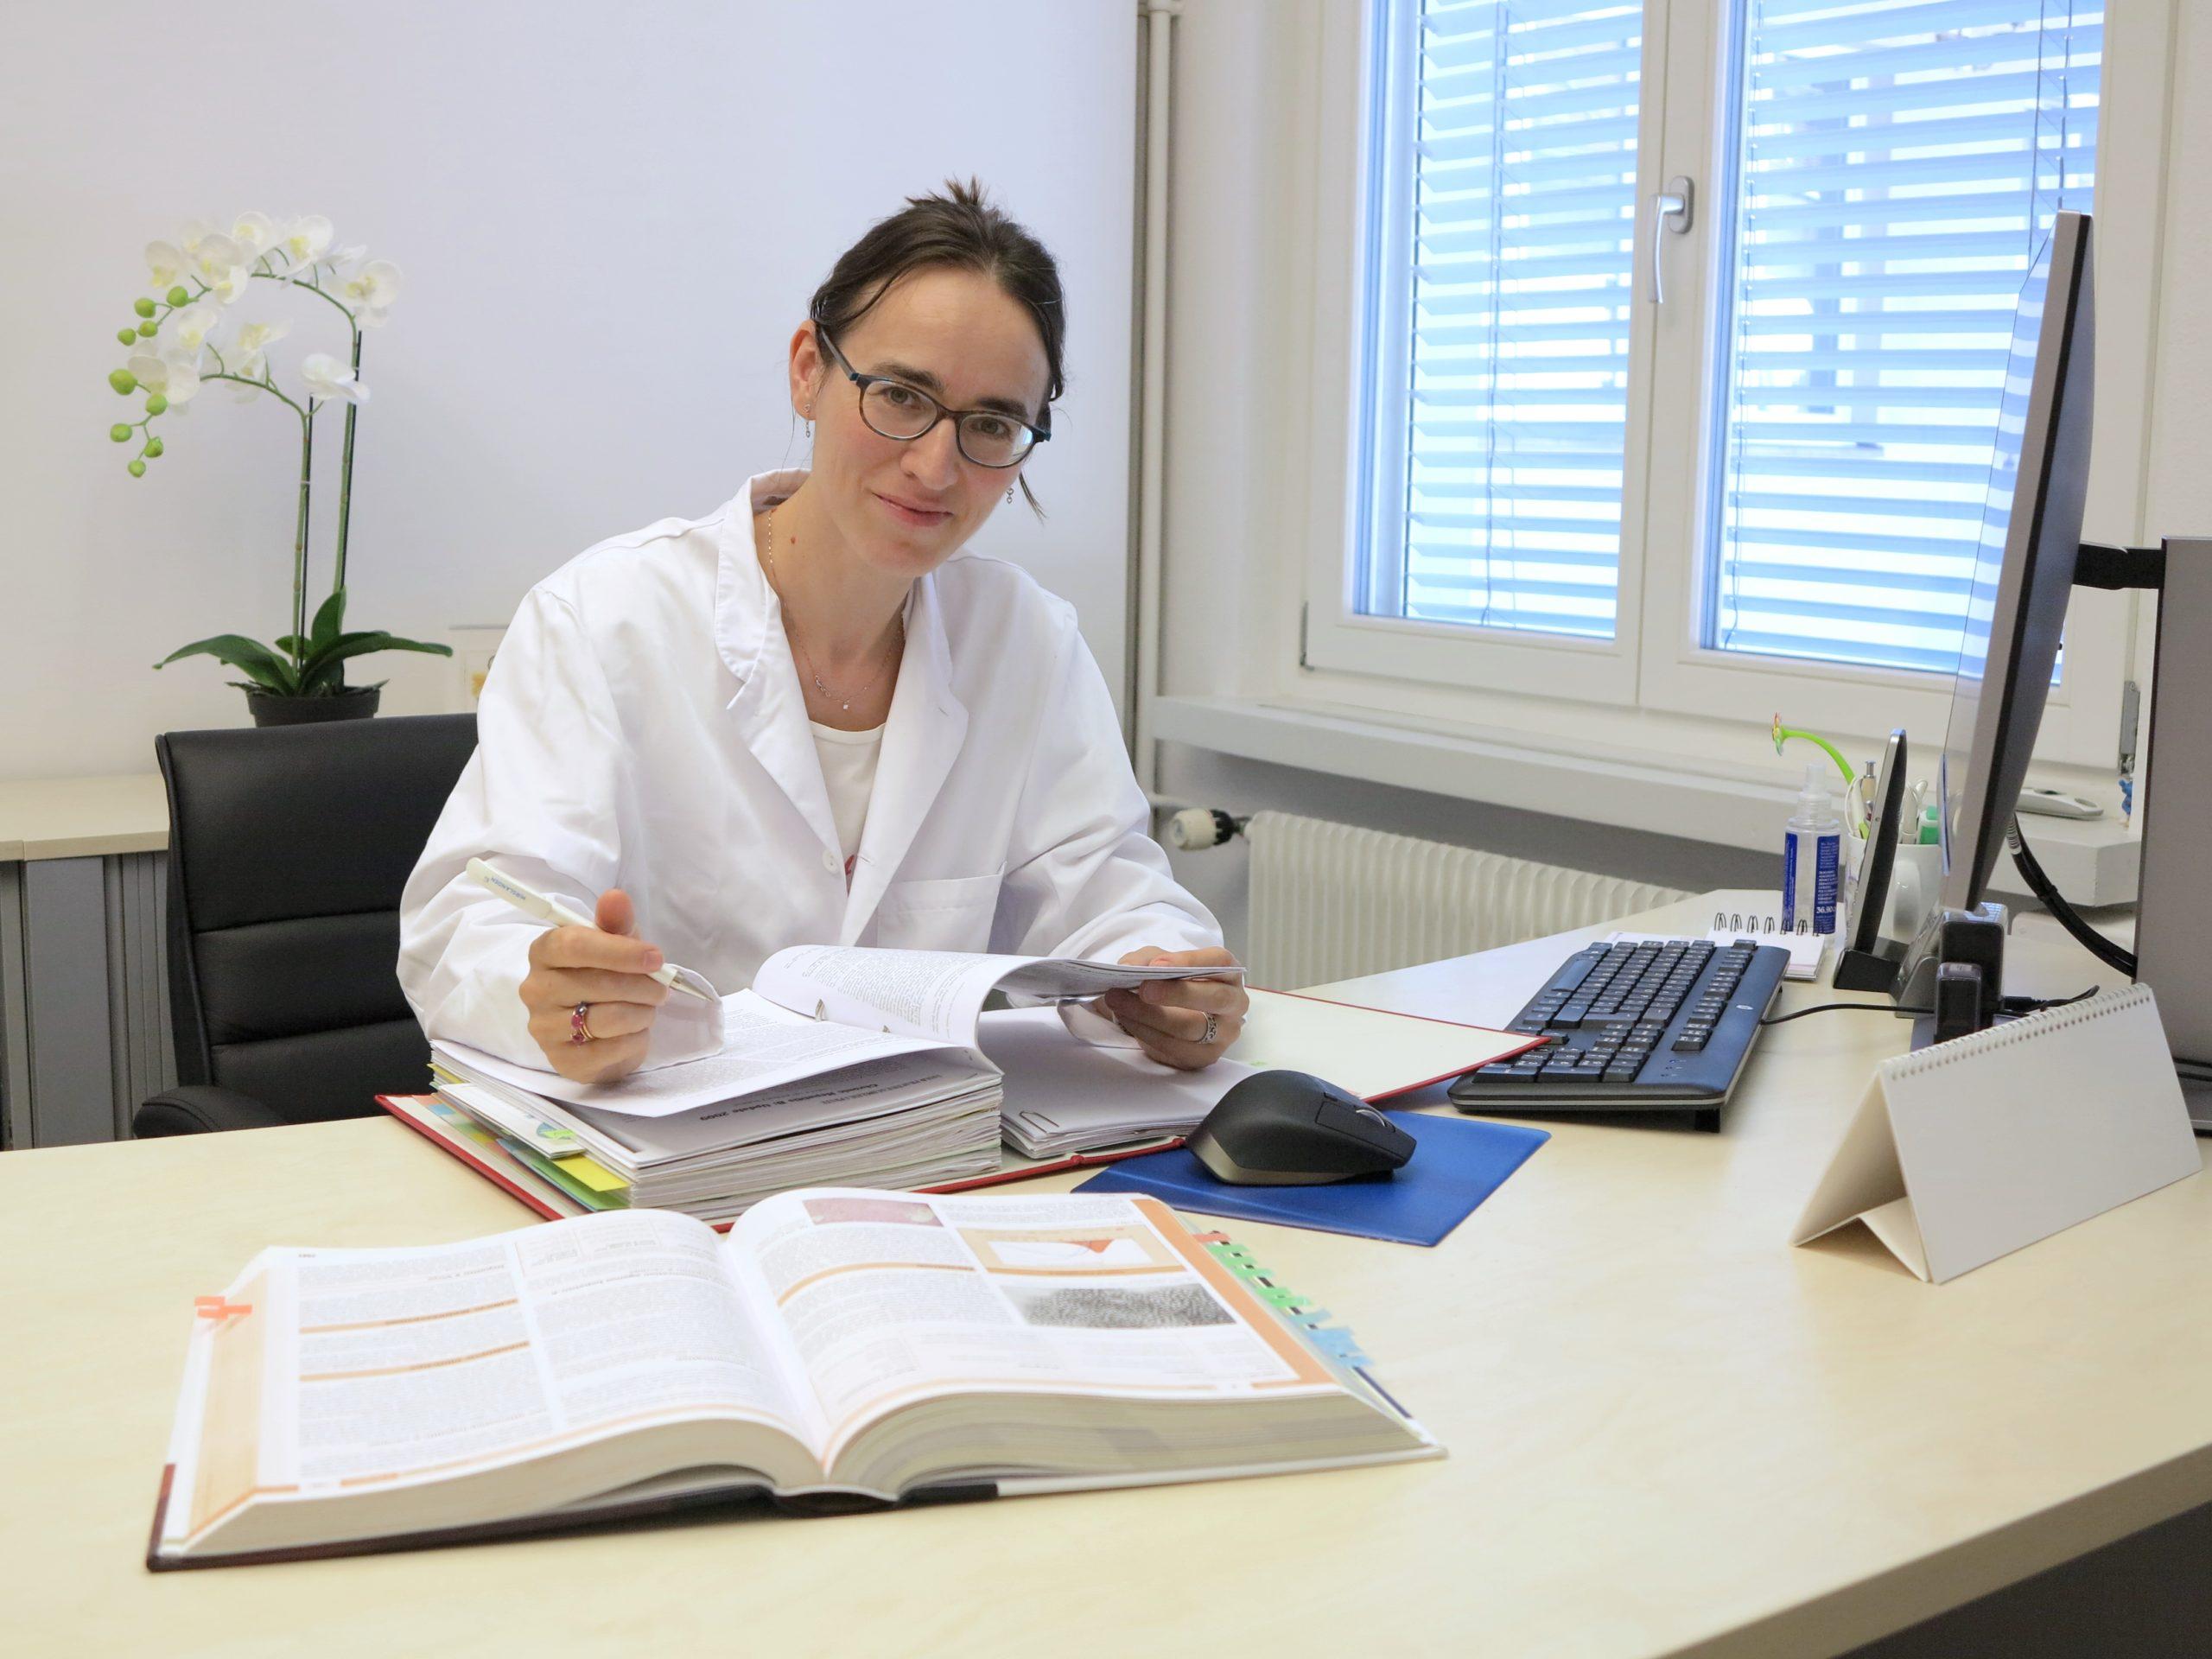 Dr. Cornelia De Torrenté